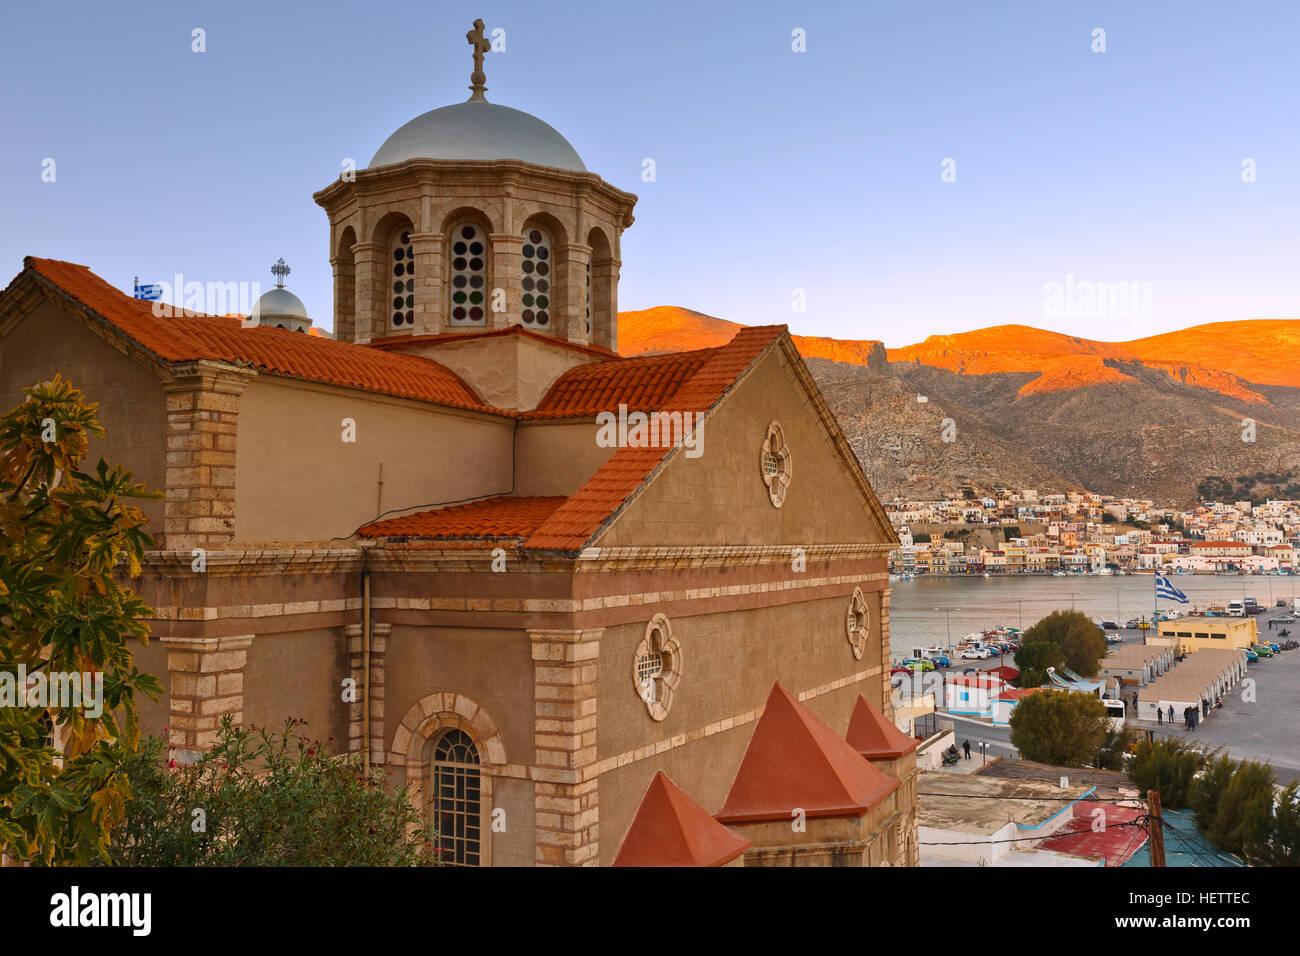 Kalymnos town on Kalymnos island in Greece. - Stock Image